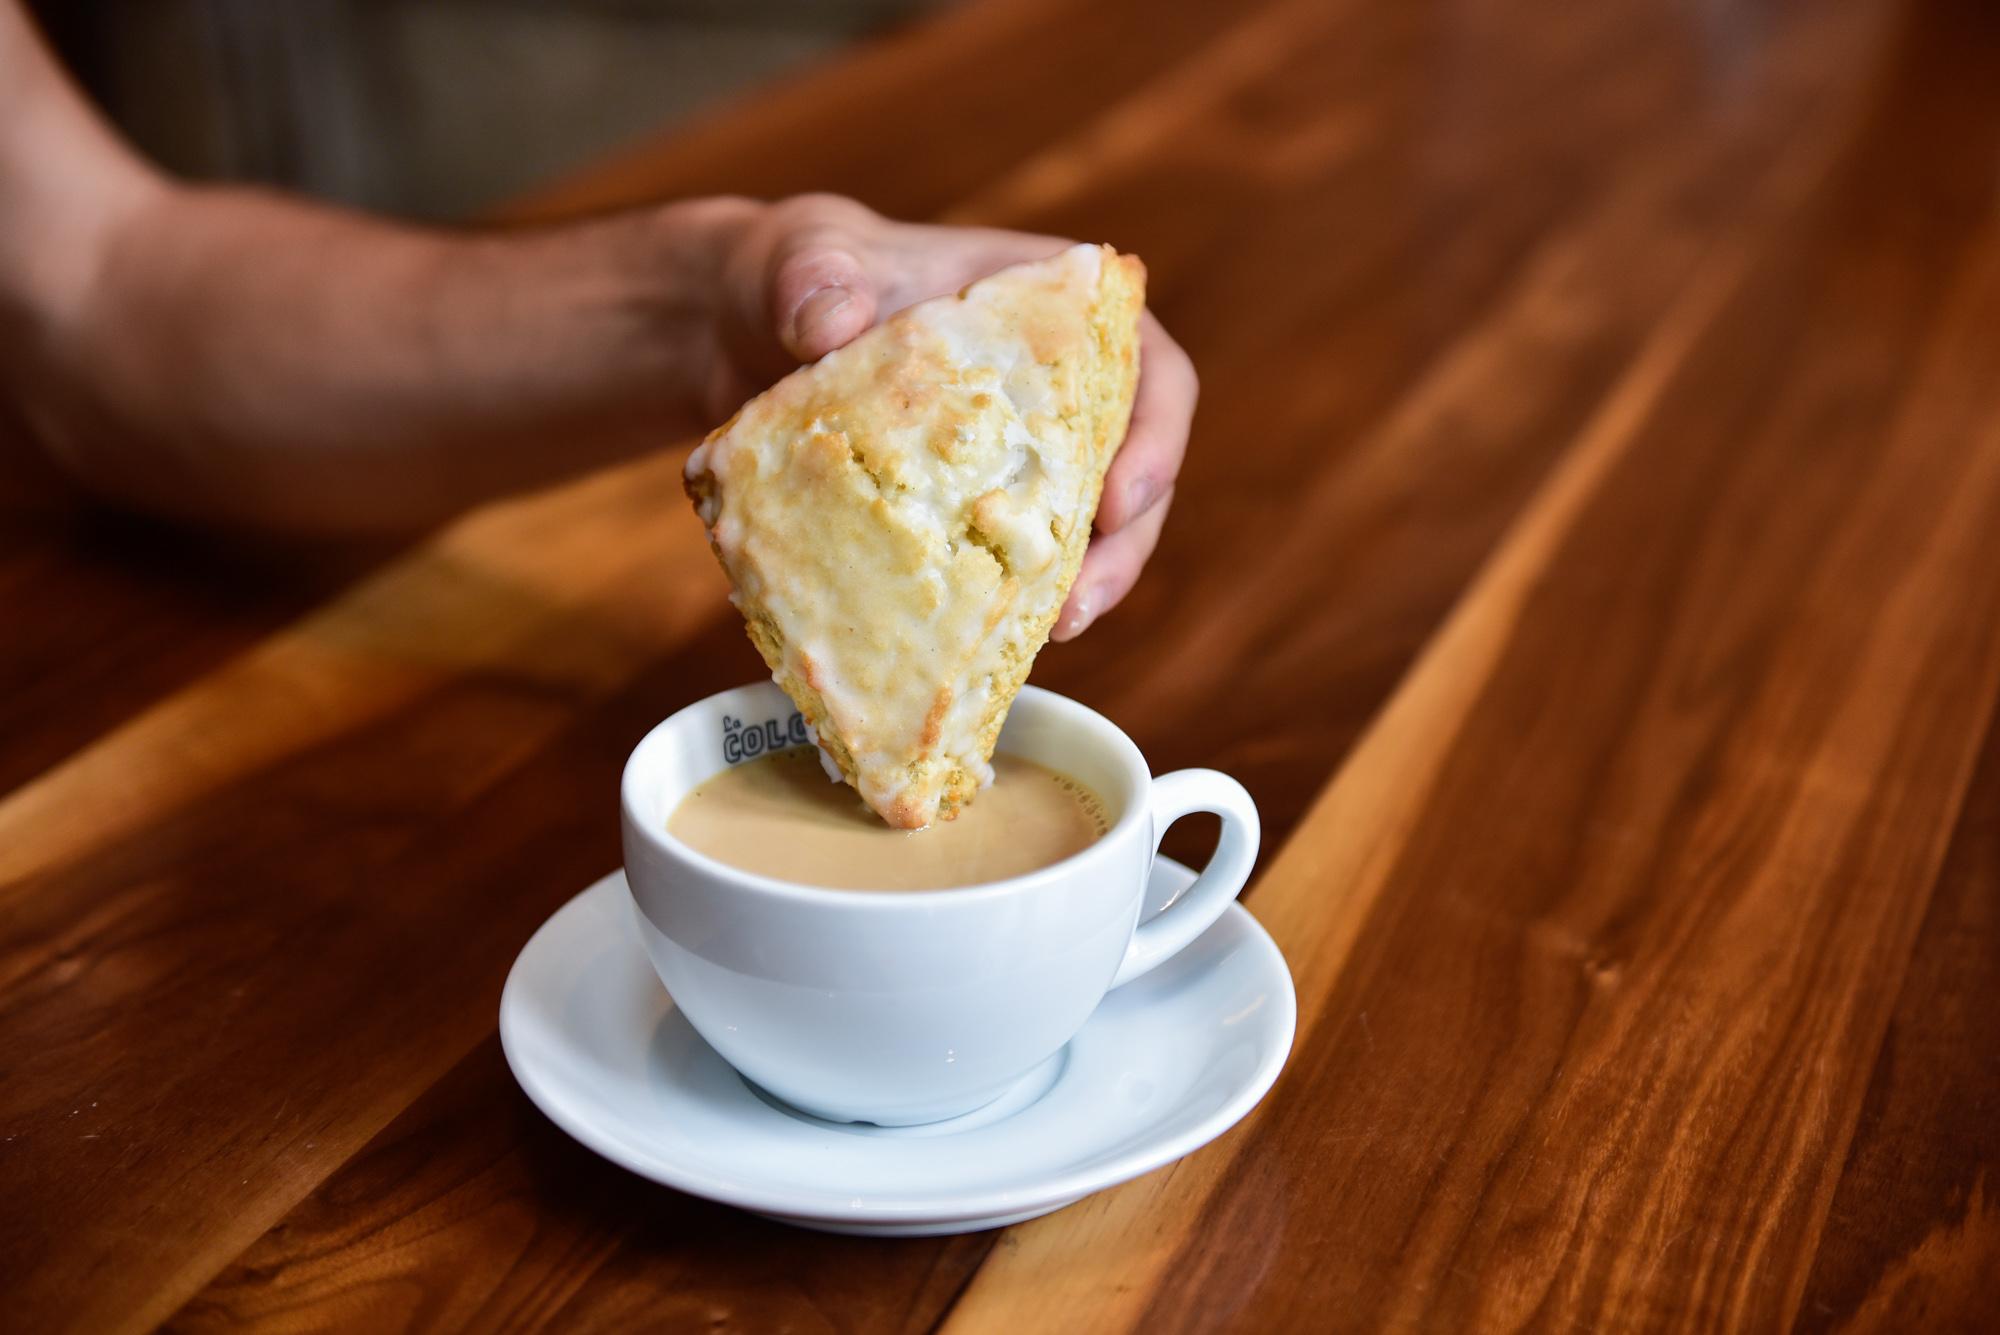 coffee lingo caf au lait the daily grind. Black Bedroom Furniture Sets. Home Design Ideas